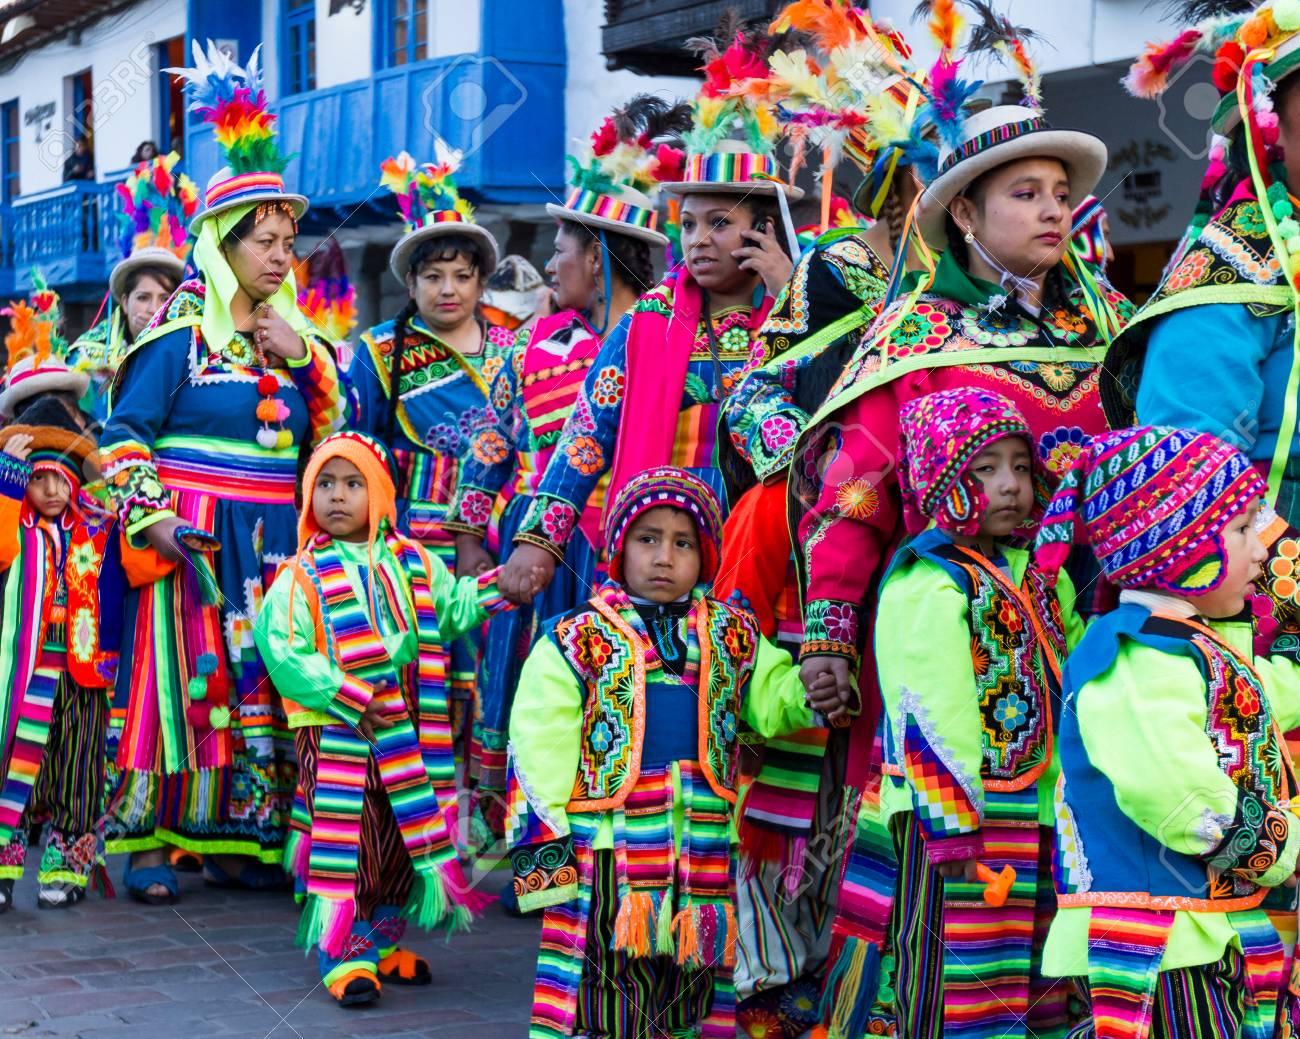 Cusco, Peru - May 13: Native people of Cusco dressed in colorful